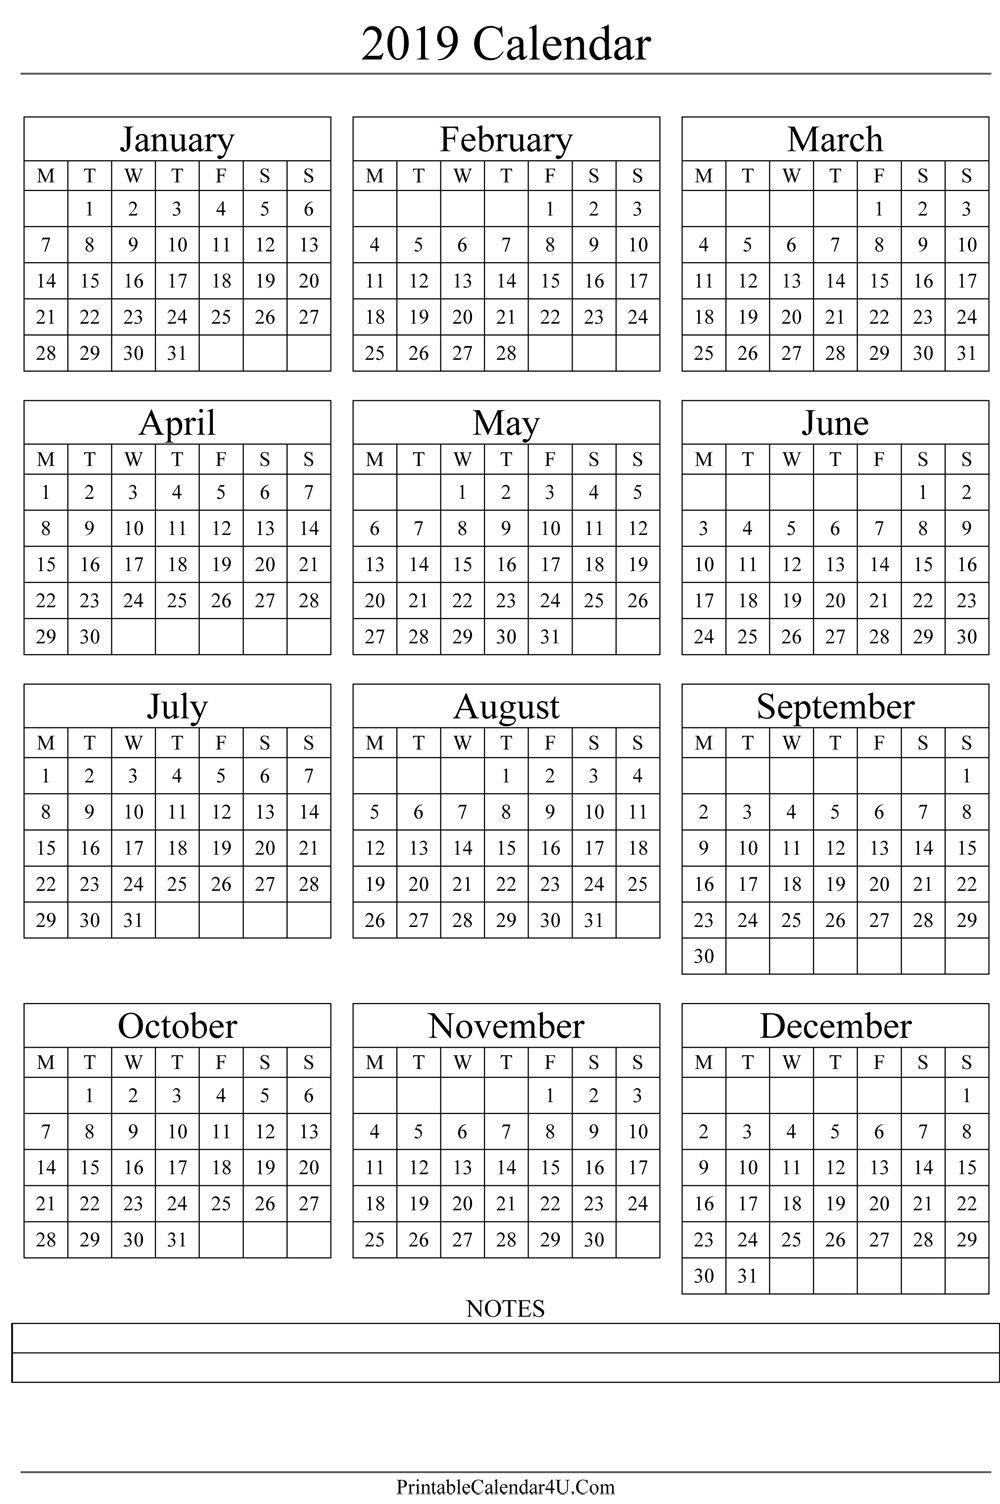 Annual Calendar 2019 Portrait Printable Calendar 2017 2018 2019 1 Year Calendar 2019